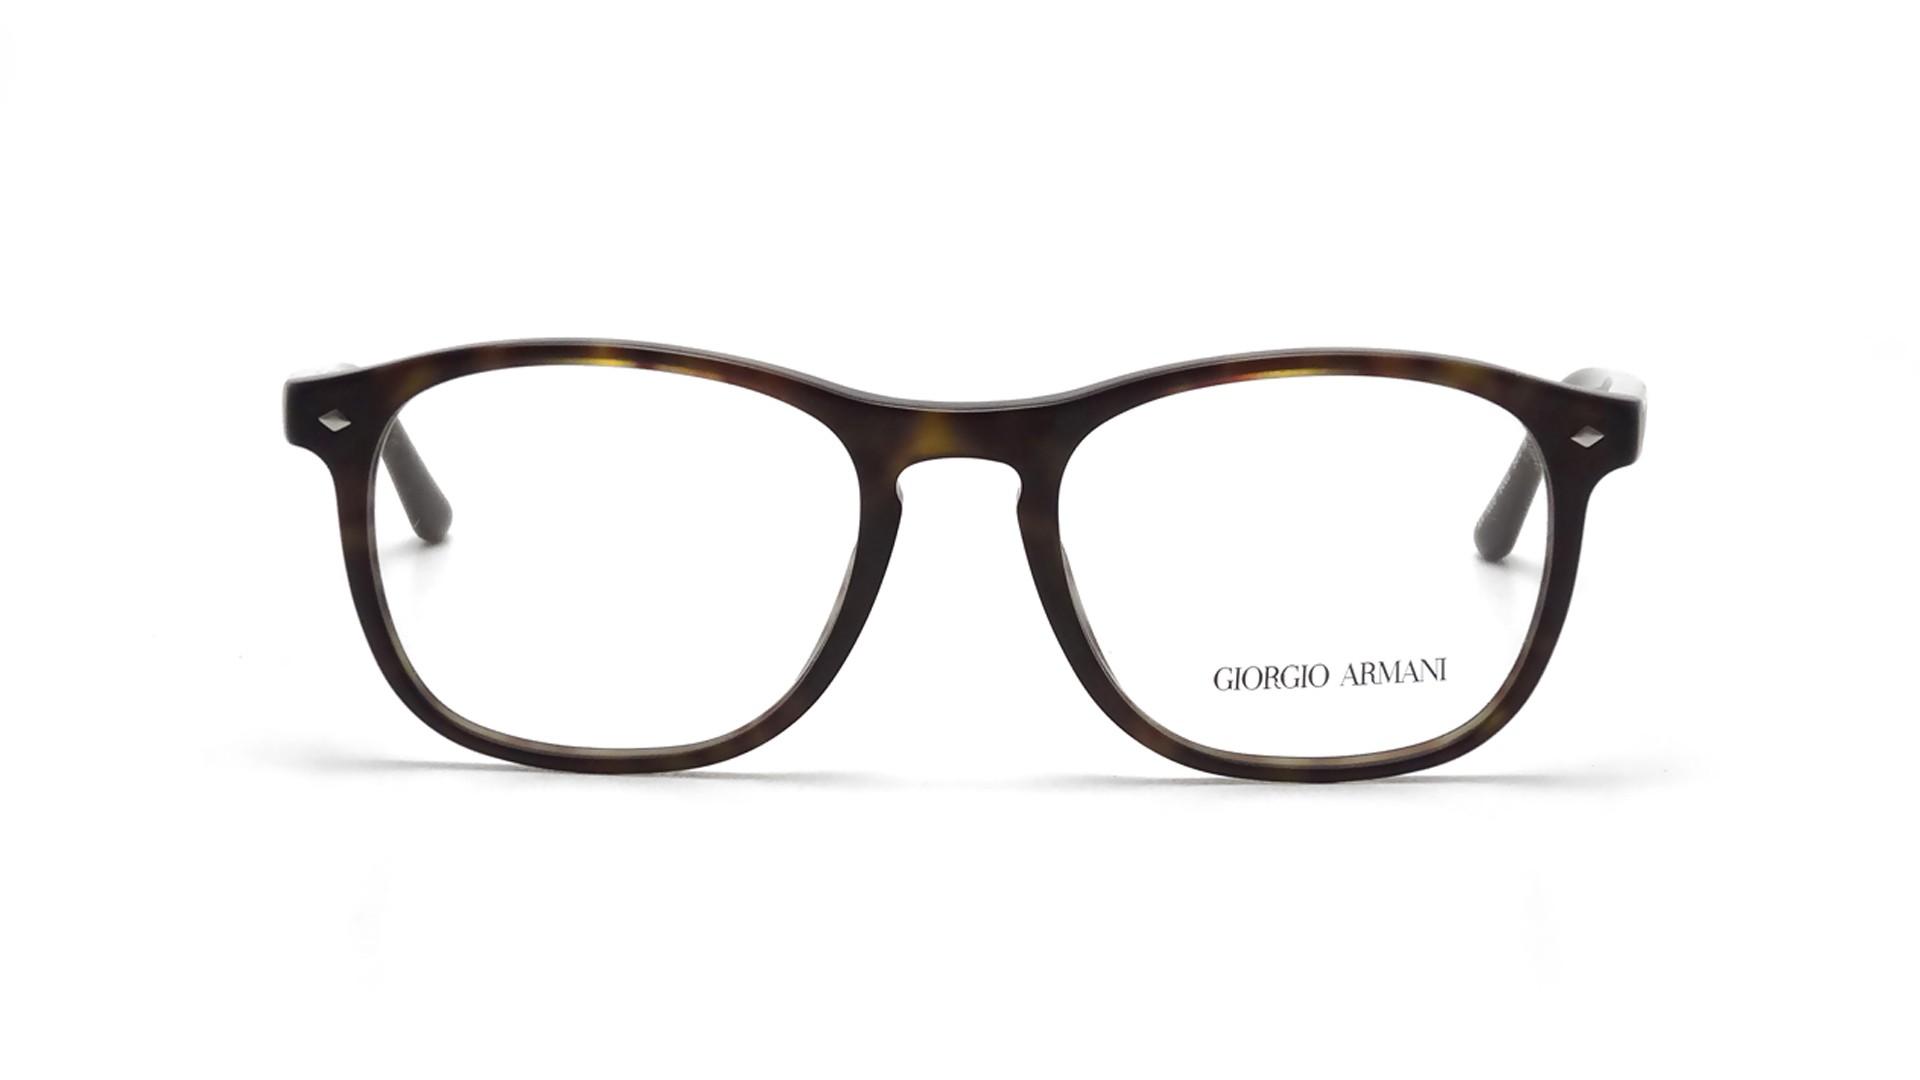 Lunettes de vue Giorgio Armani Frames of Life Écaille AR7003 5002 50-18  Medium cbc17b57d0e1